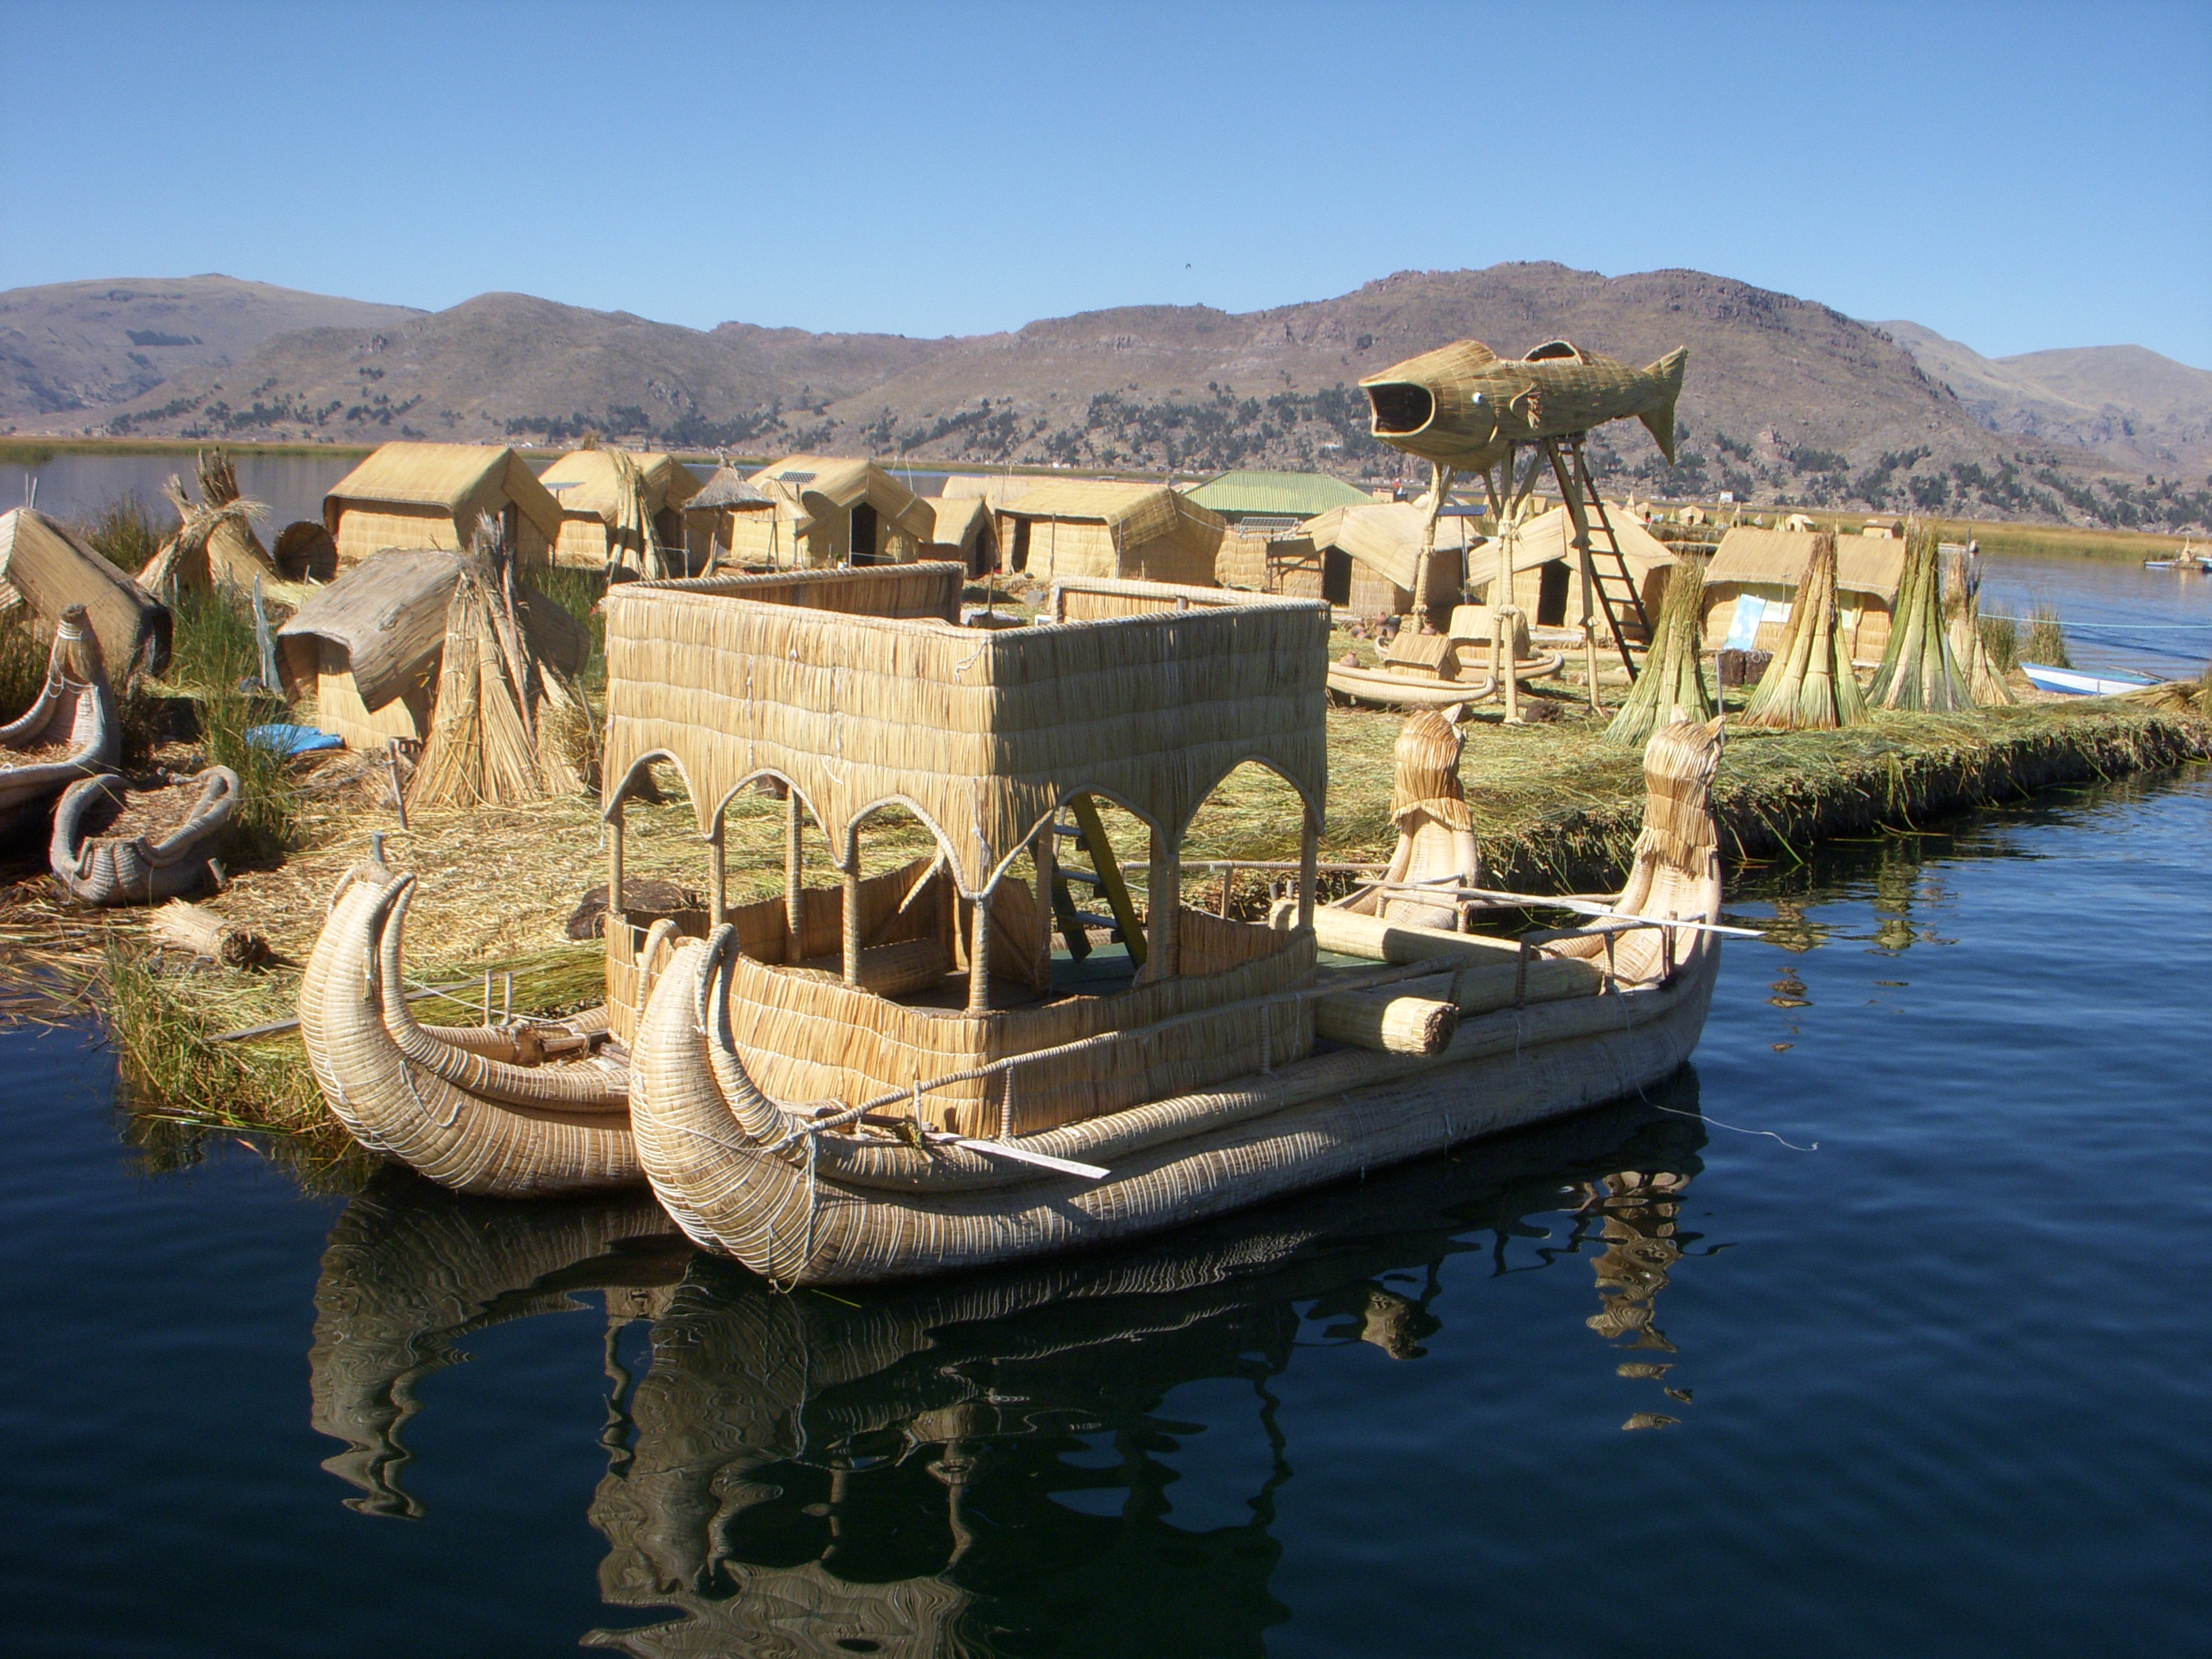 Floating_Islands_(Puno)